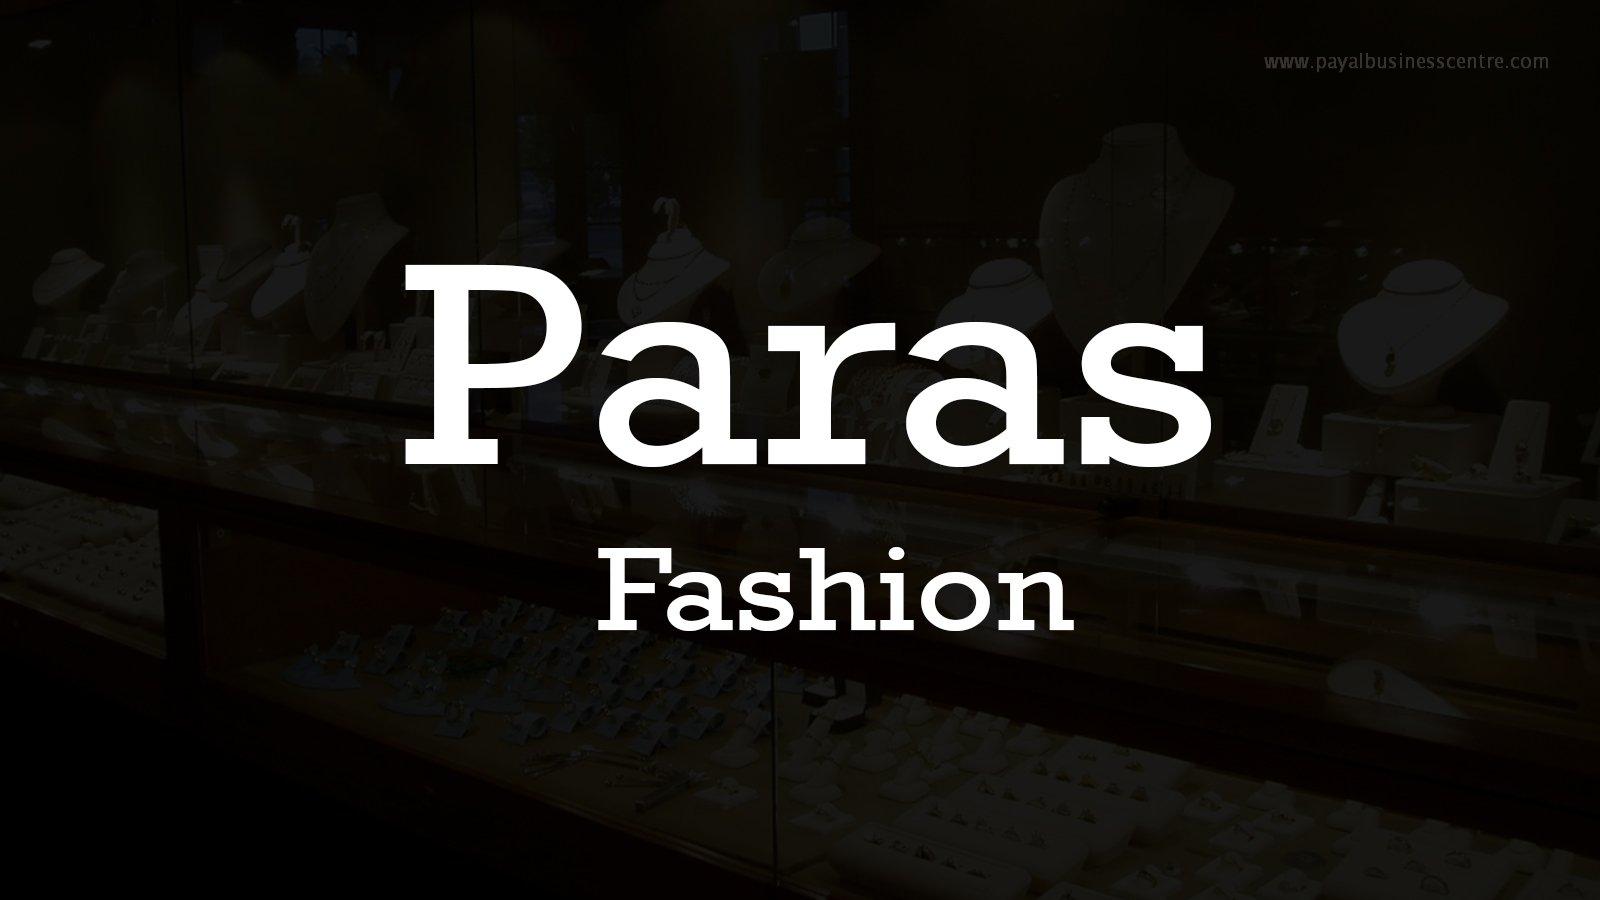 Paras Fashion